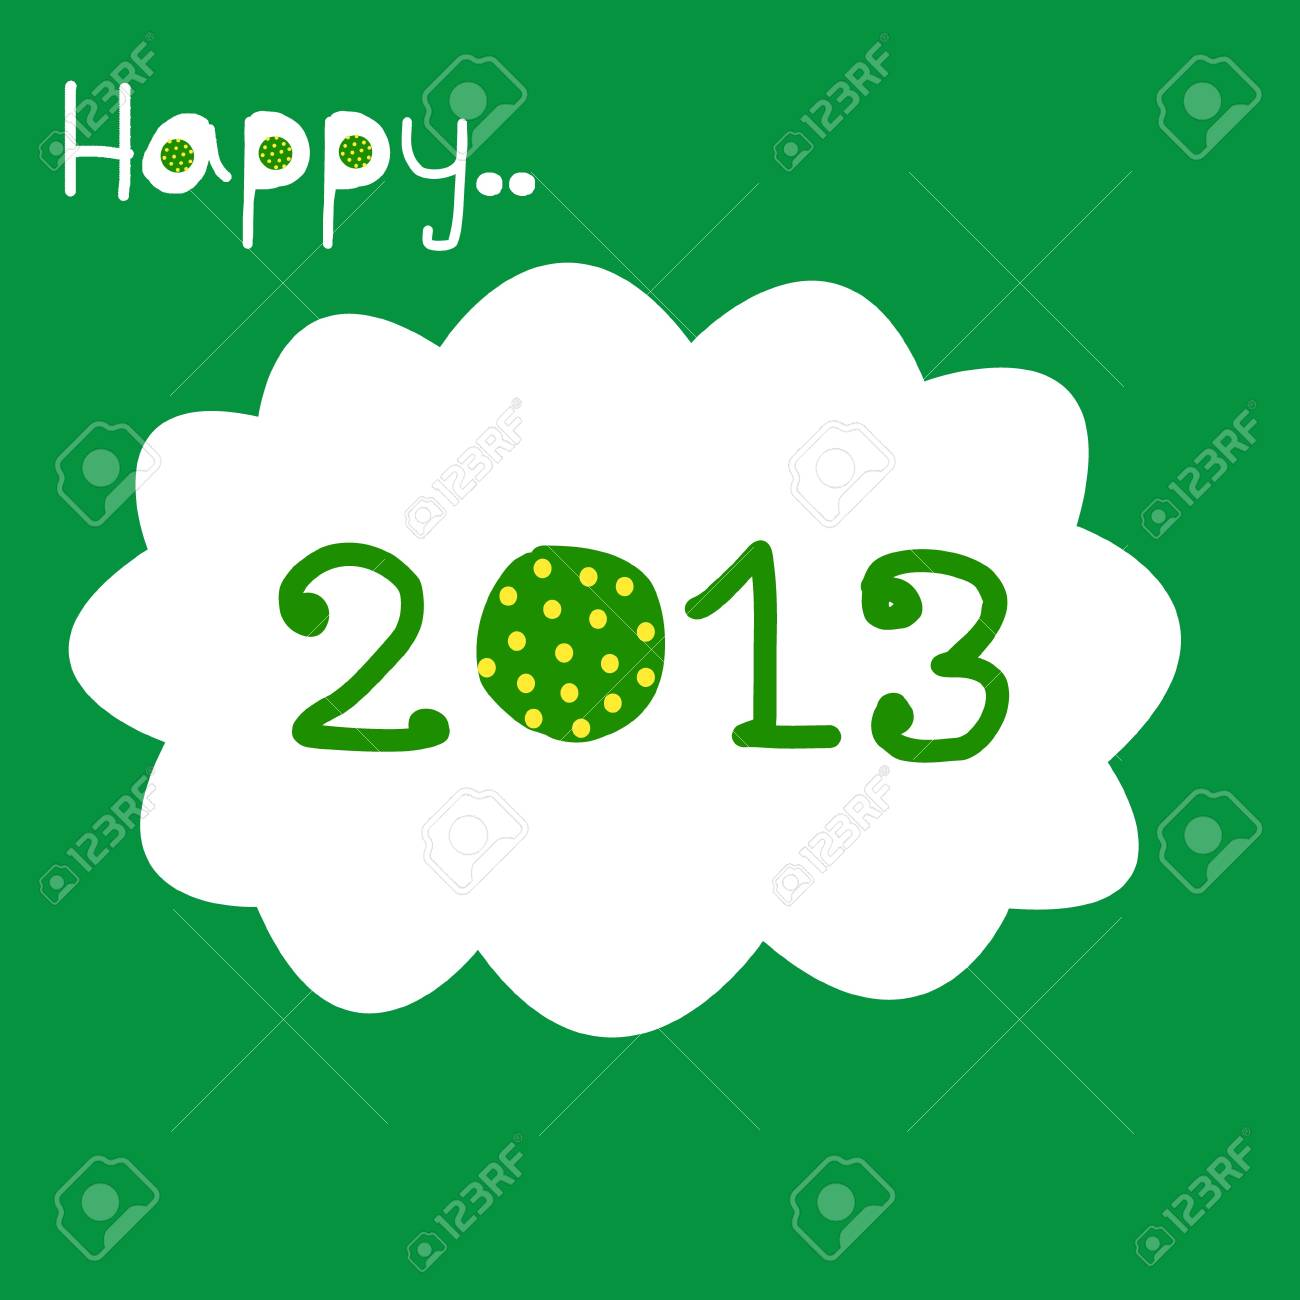 Happy New Year 2013 with polka dot_green Stock Vector - 17010961